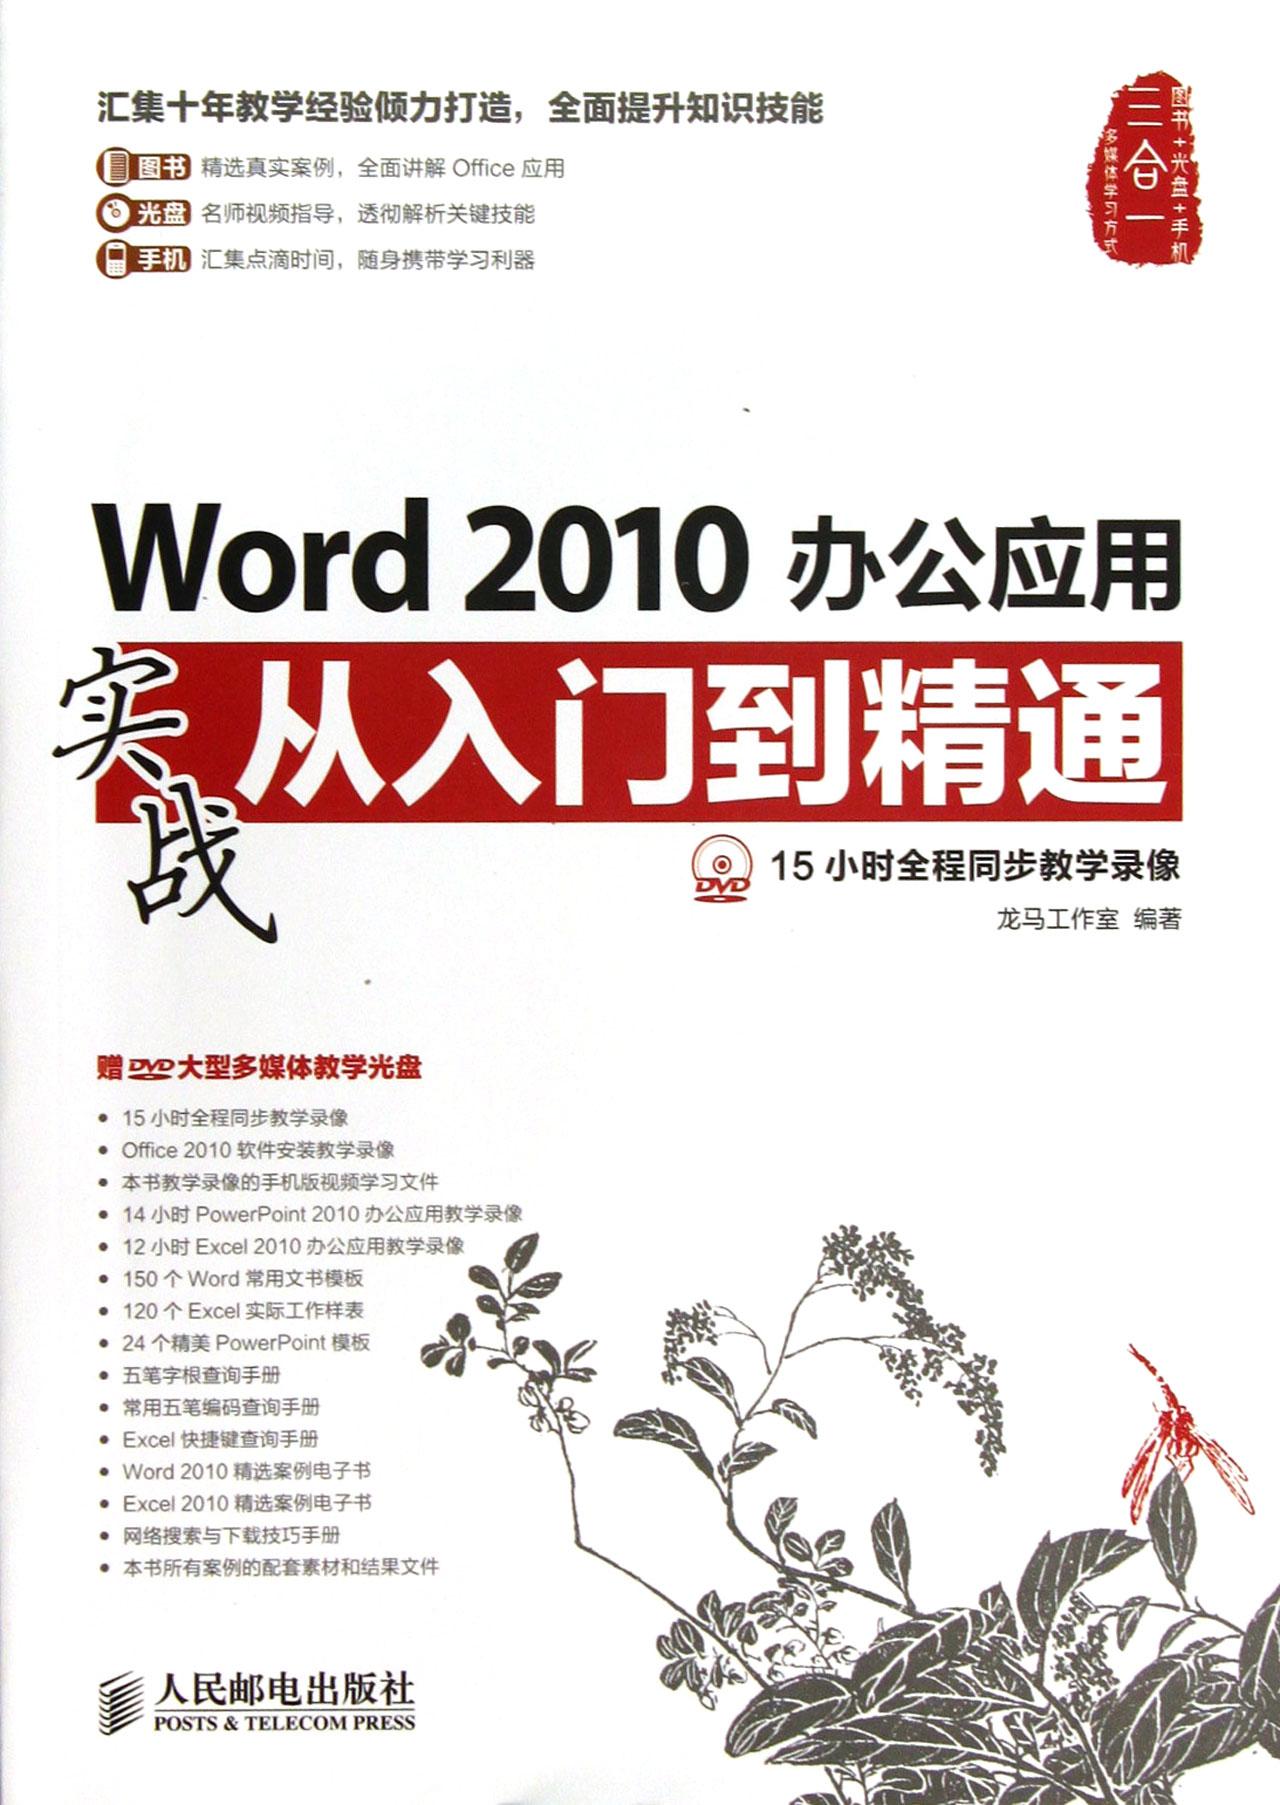 word2010模板文件扩展名